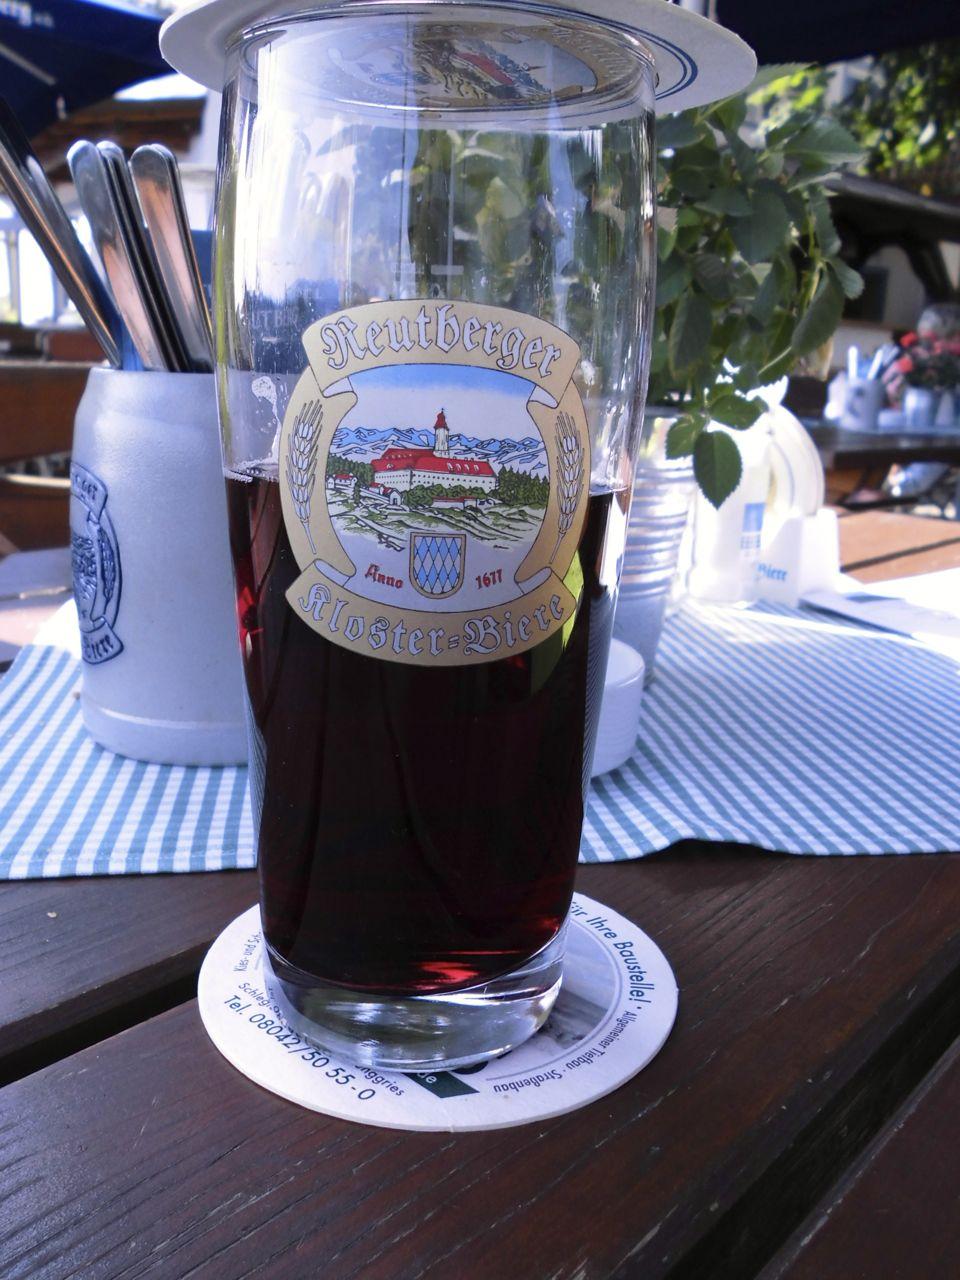 Reutberger Bier